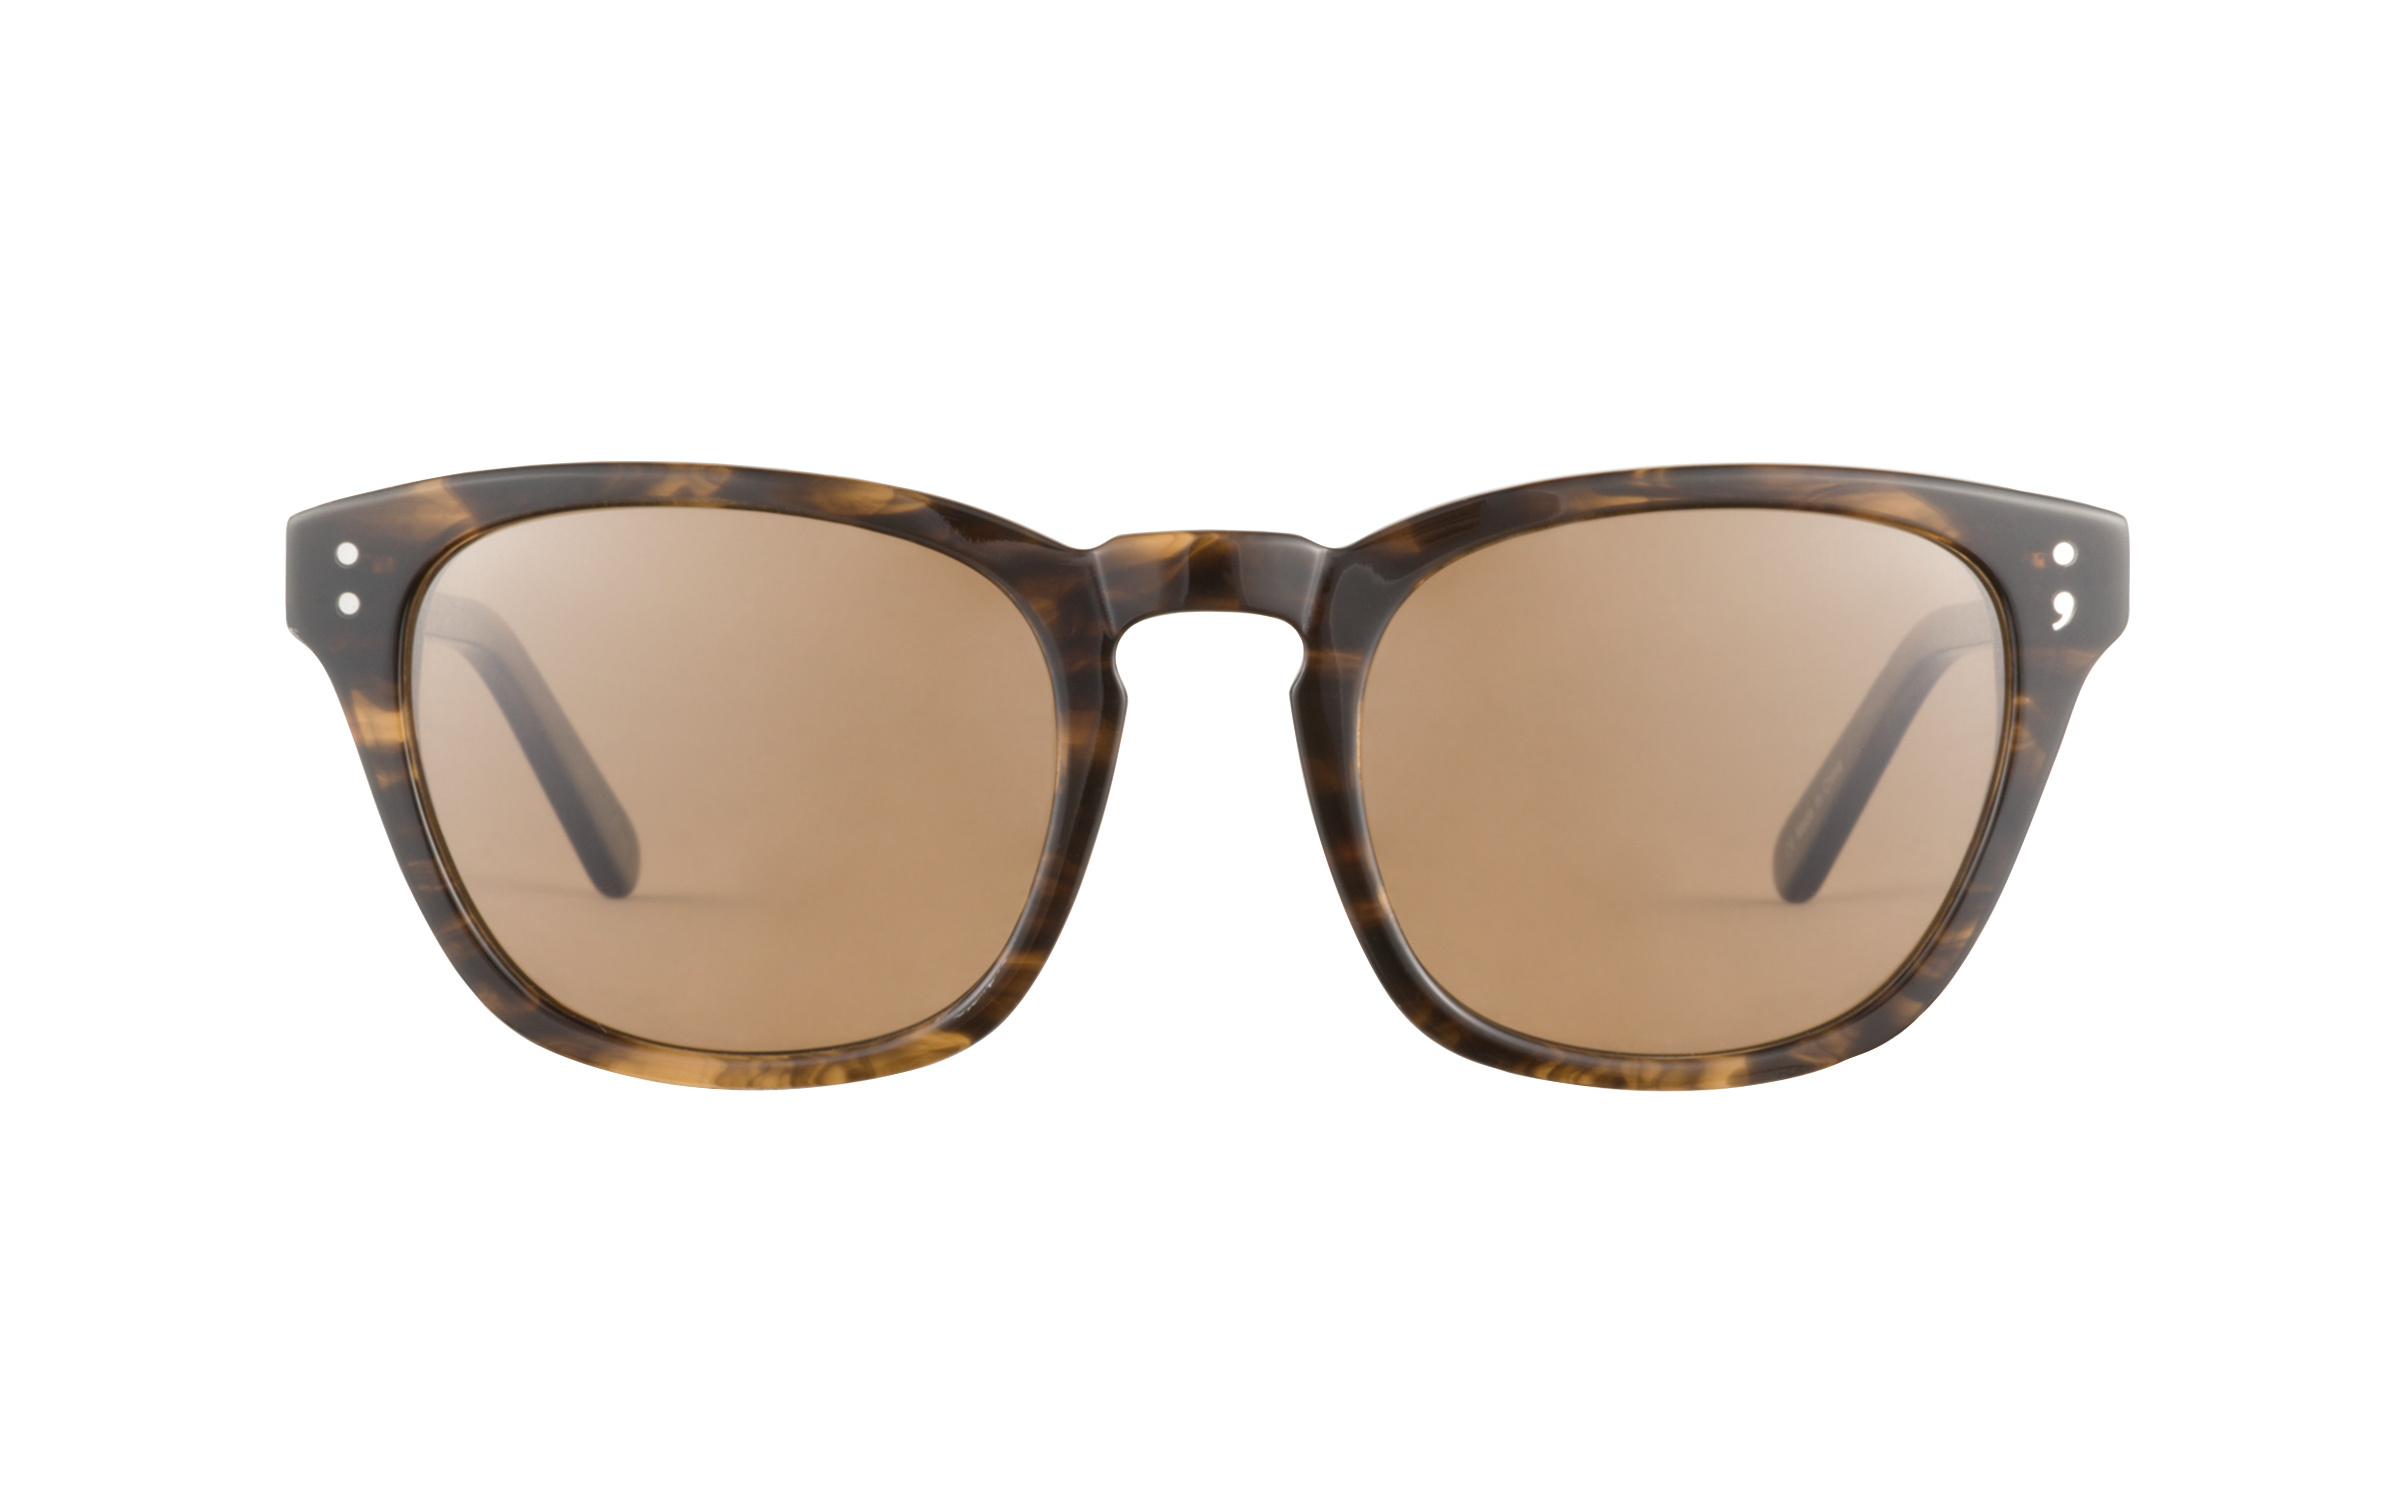 Vintage Sunglasses Green Derek Cardigan Online Coastal